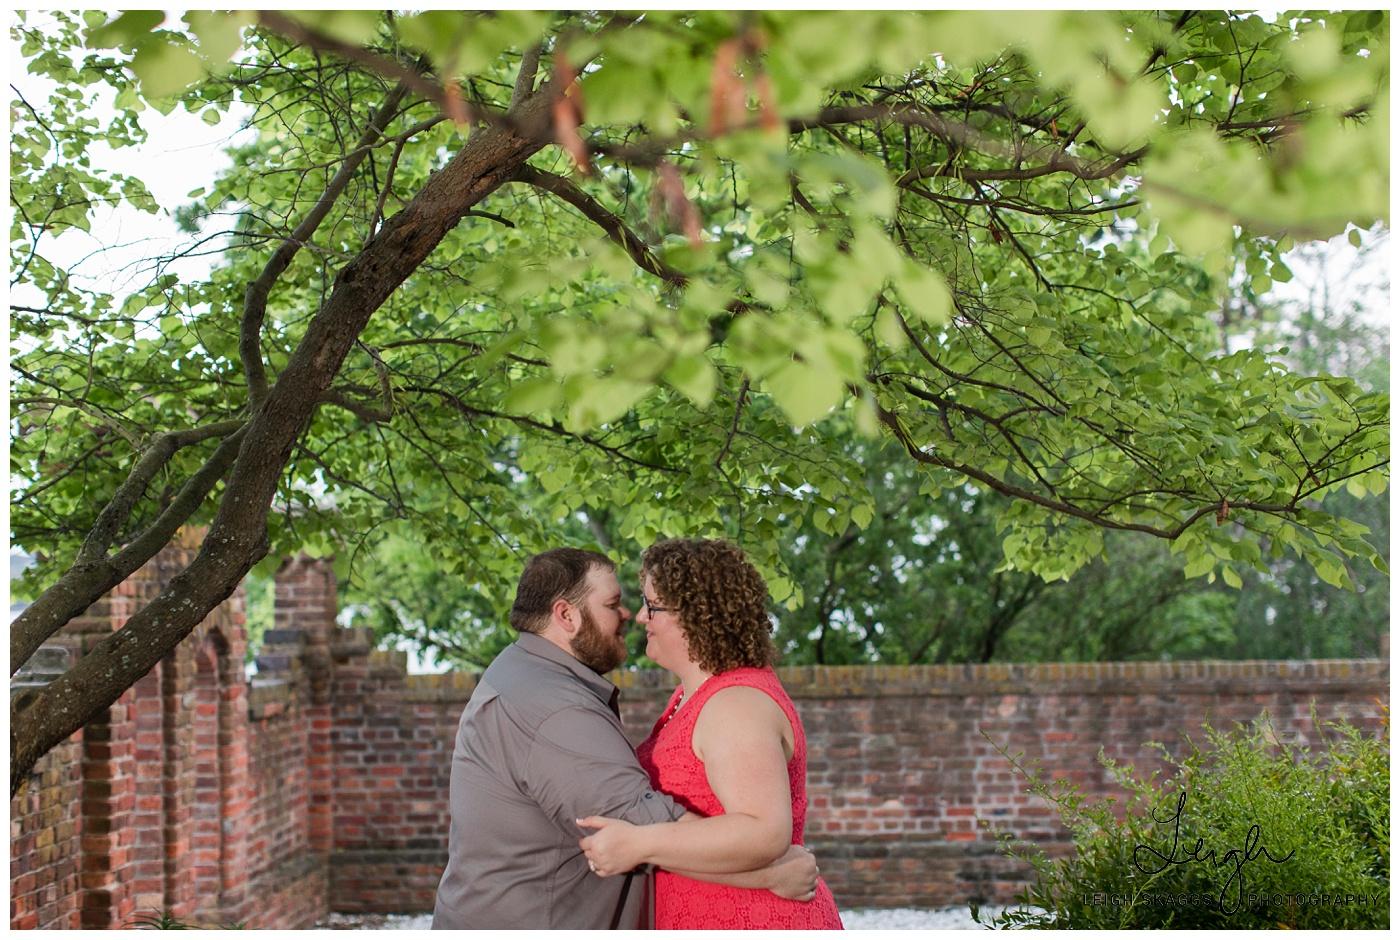 Jenna & Justin | Hermitage Museum & Garden Engagement Session